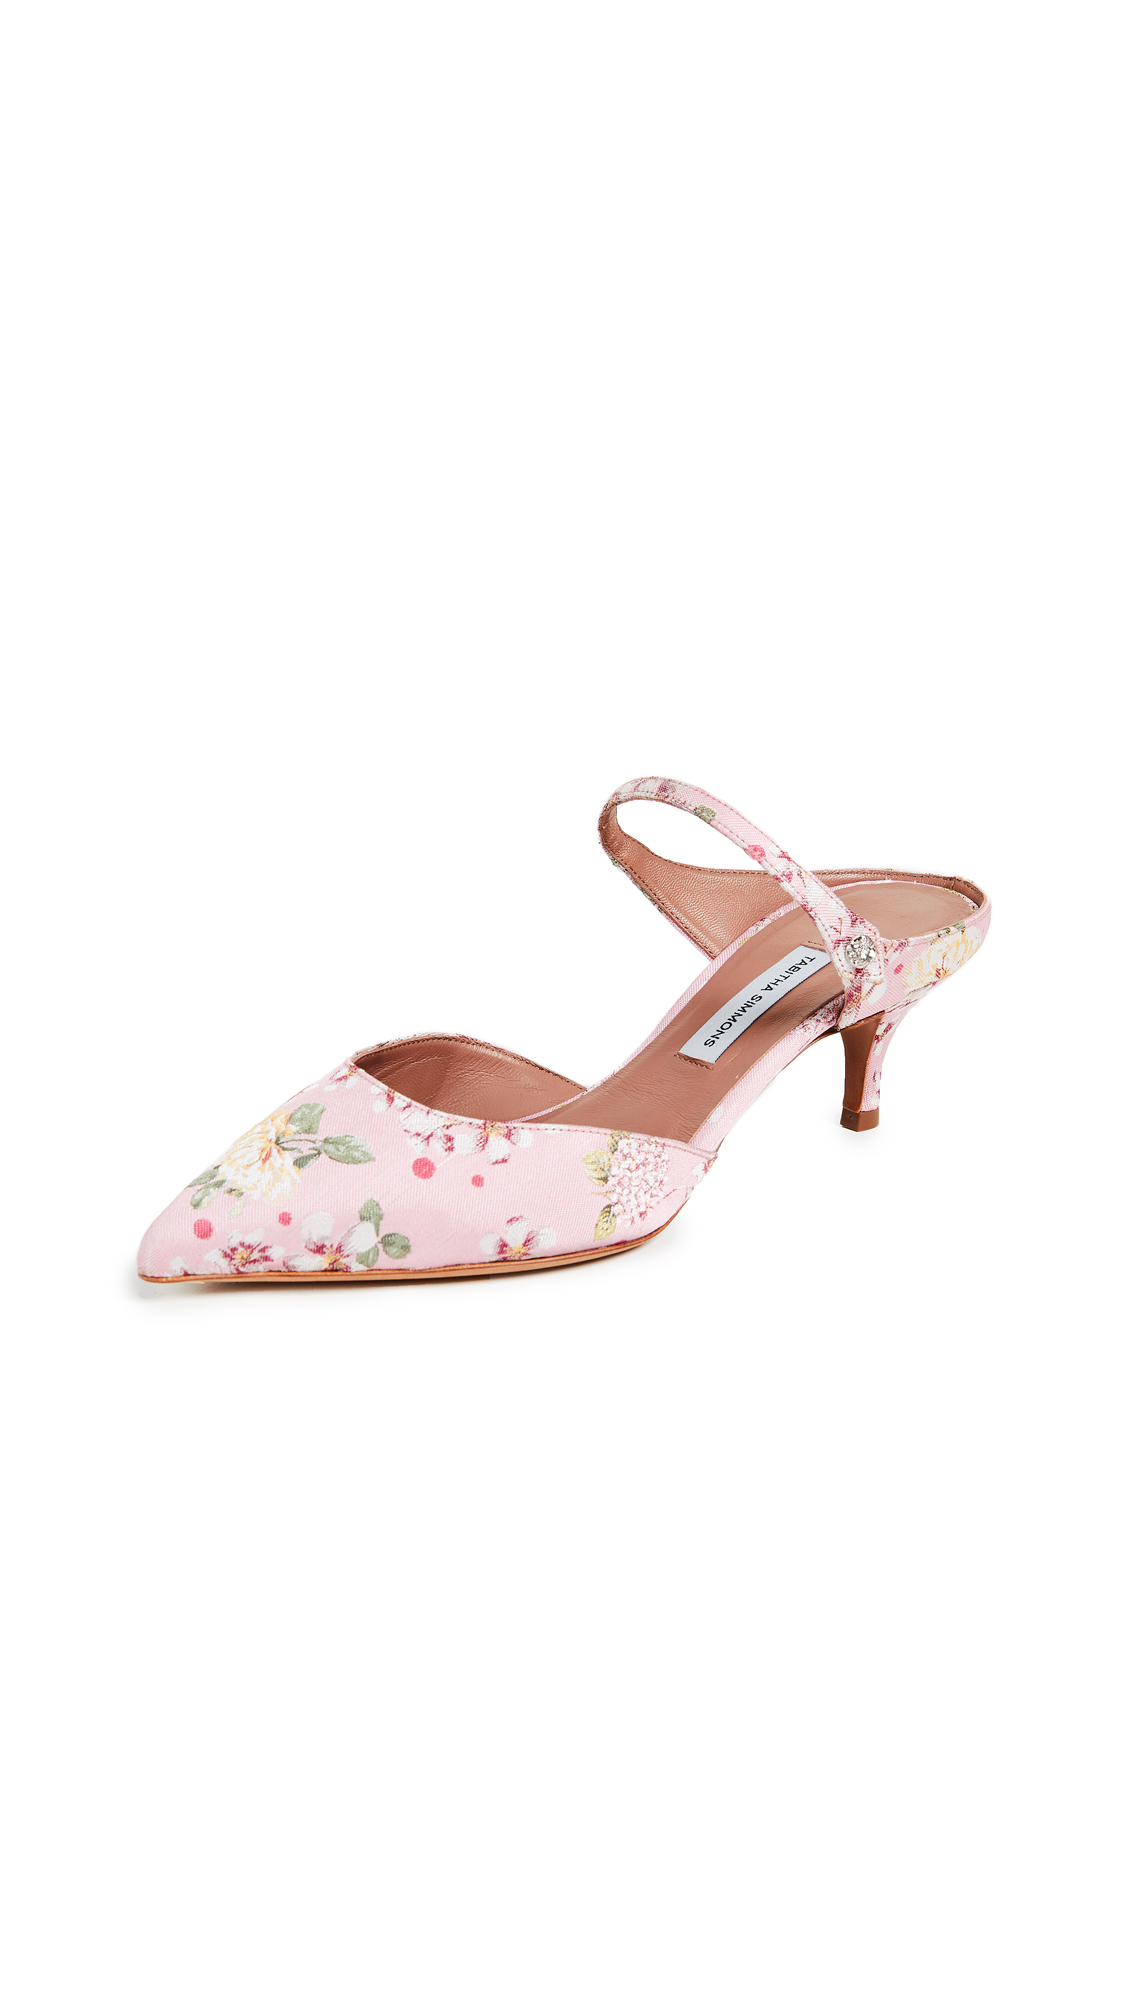 Tabitha Simmons Floral Mule Pumps - Pink Flower Jacquard